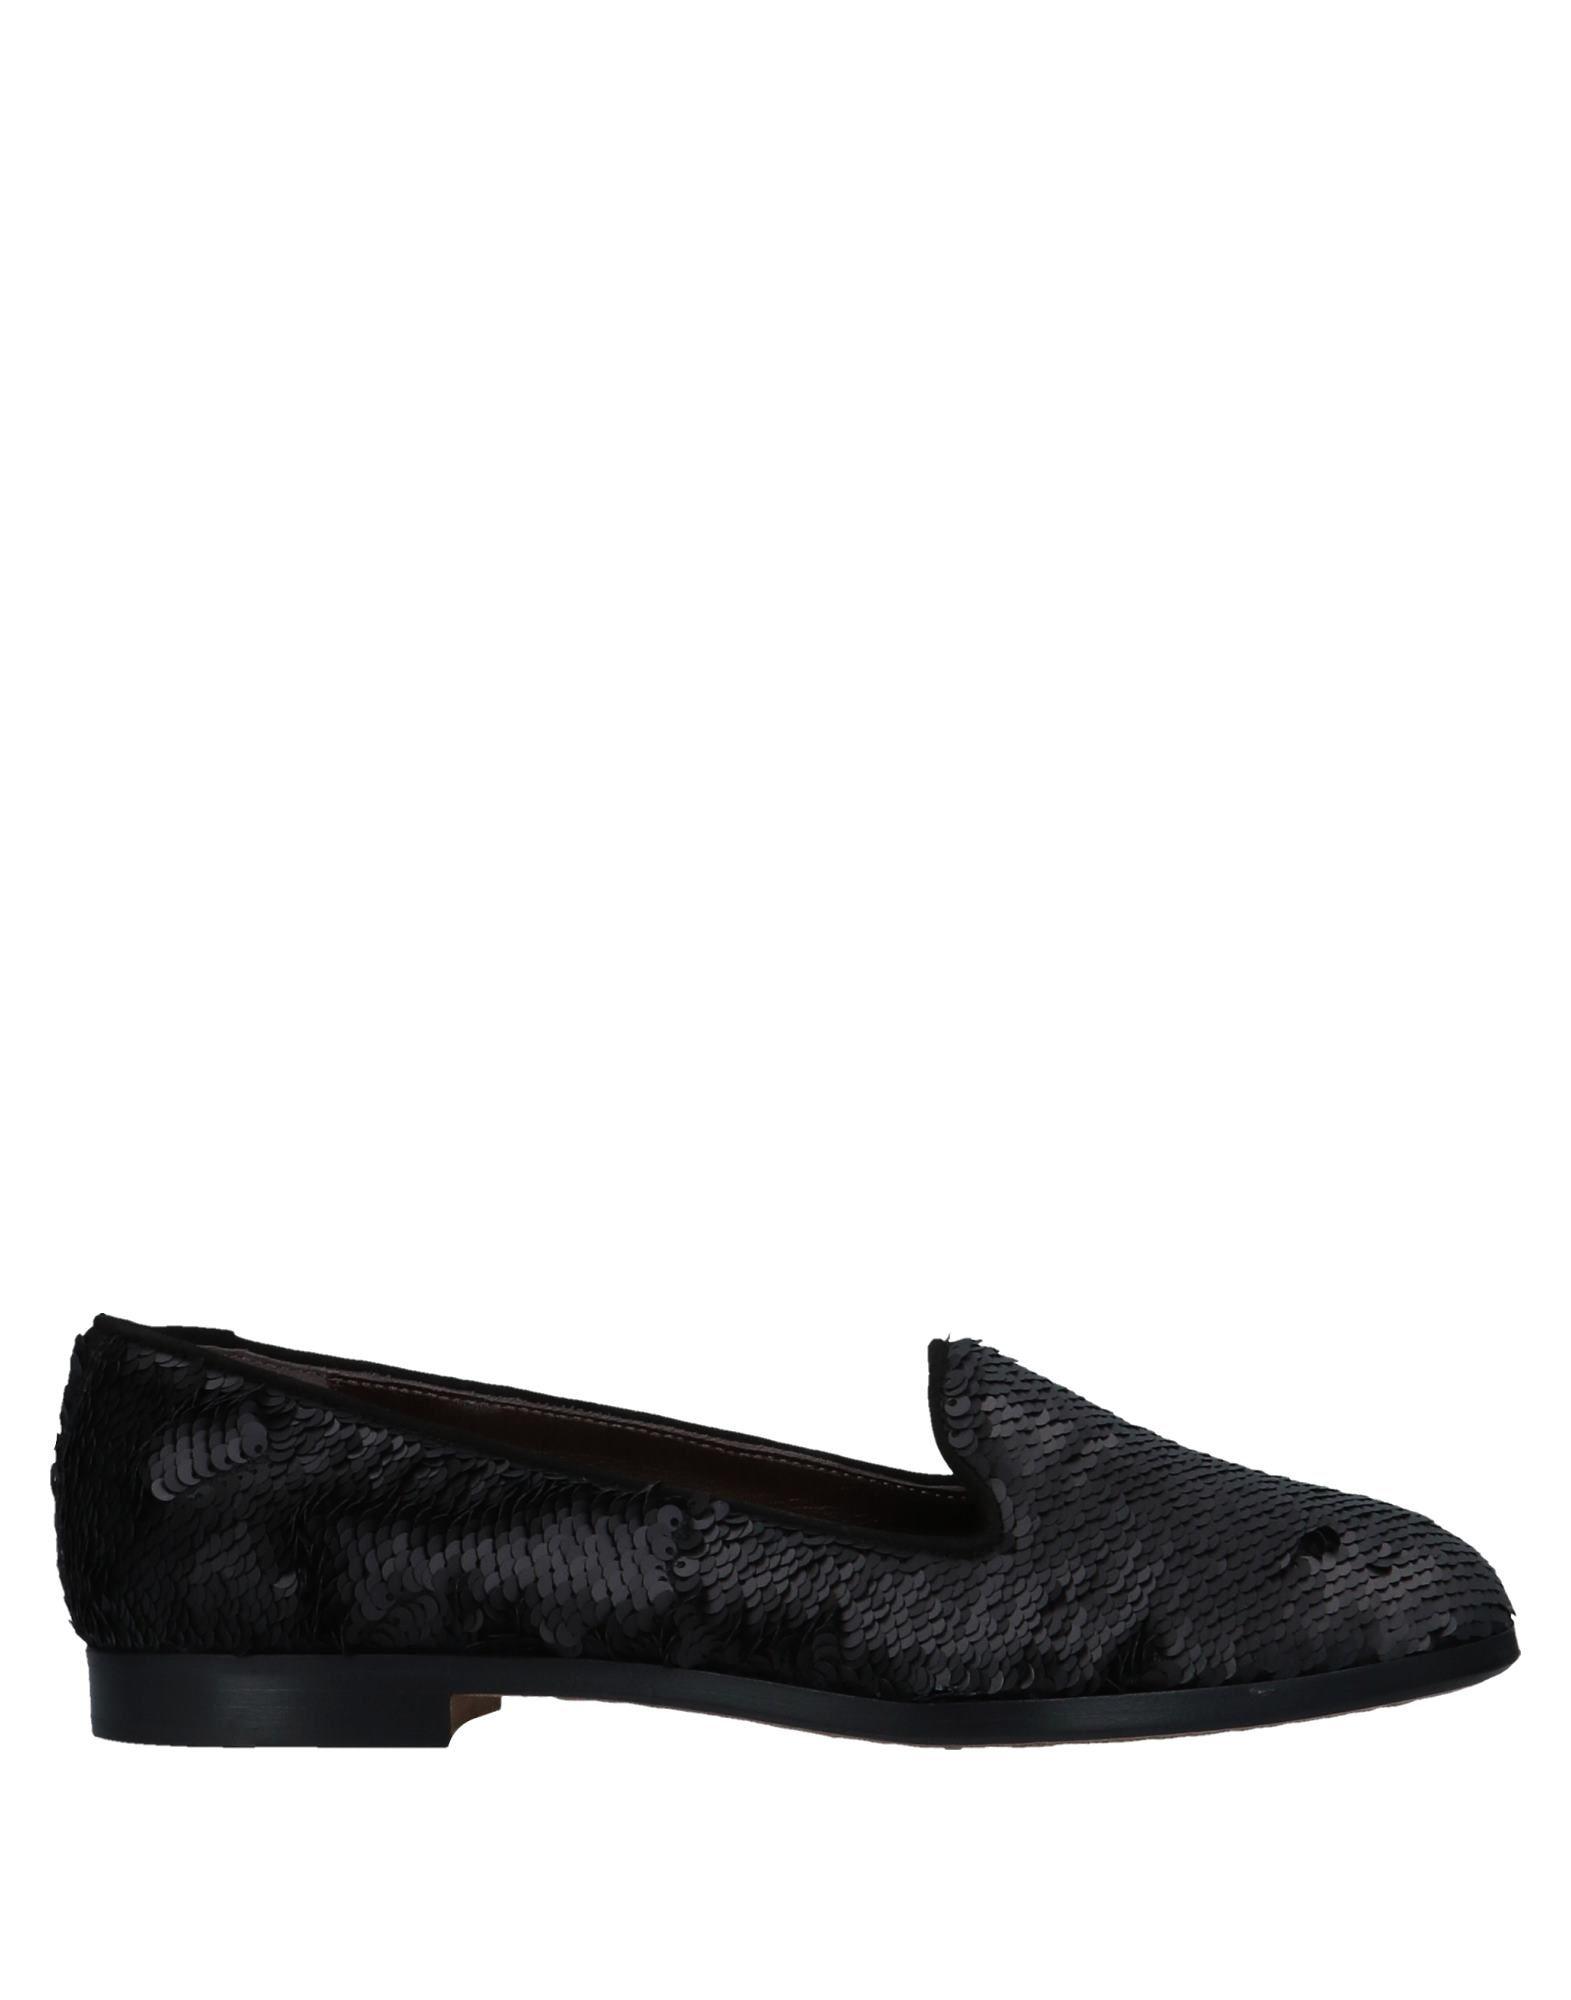 Stilvolle billige Schuhe Mokassins Agl Attilio Giusti Leombruni Mokassins Schuhe Damen  11539985BG 8ba351